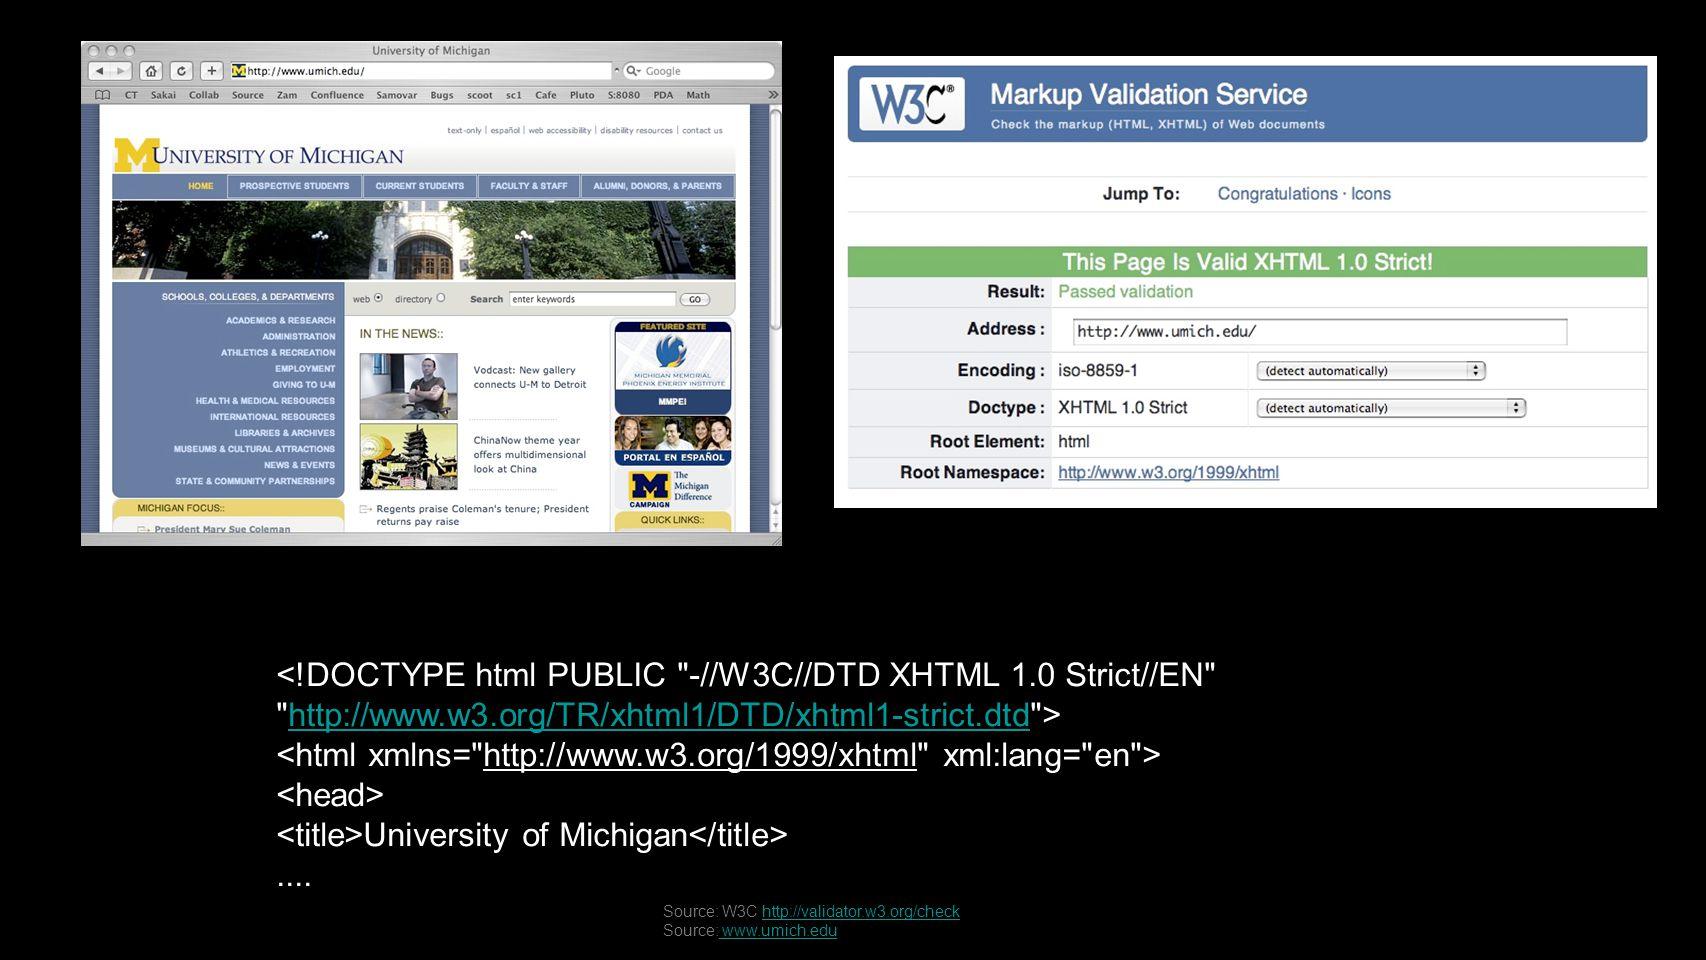 http://www.w3.org/TR/xhtml1/DTD/xhtml1-strict.dtd University of Michigan....